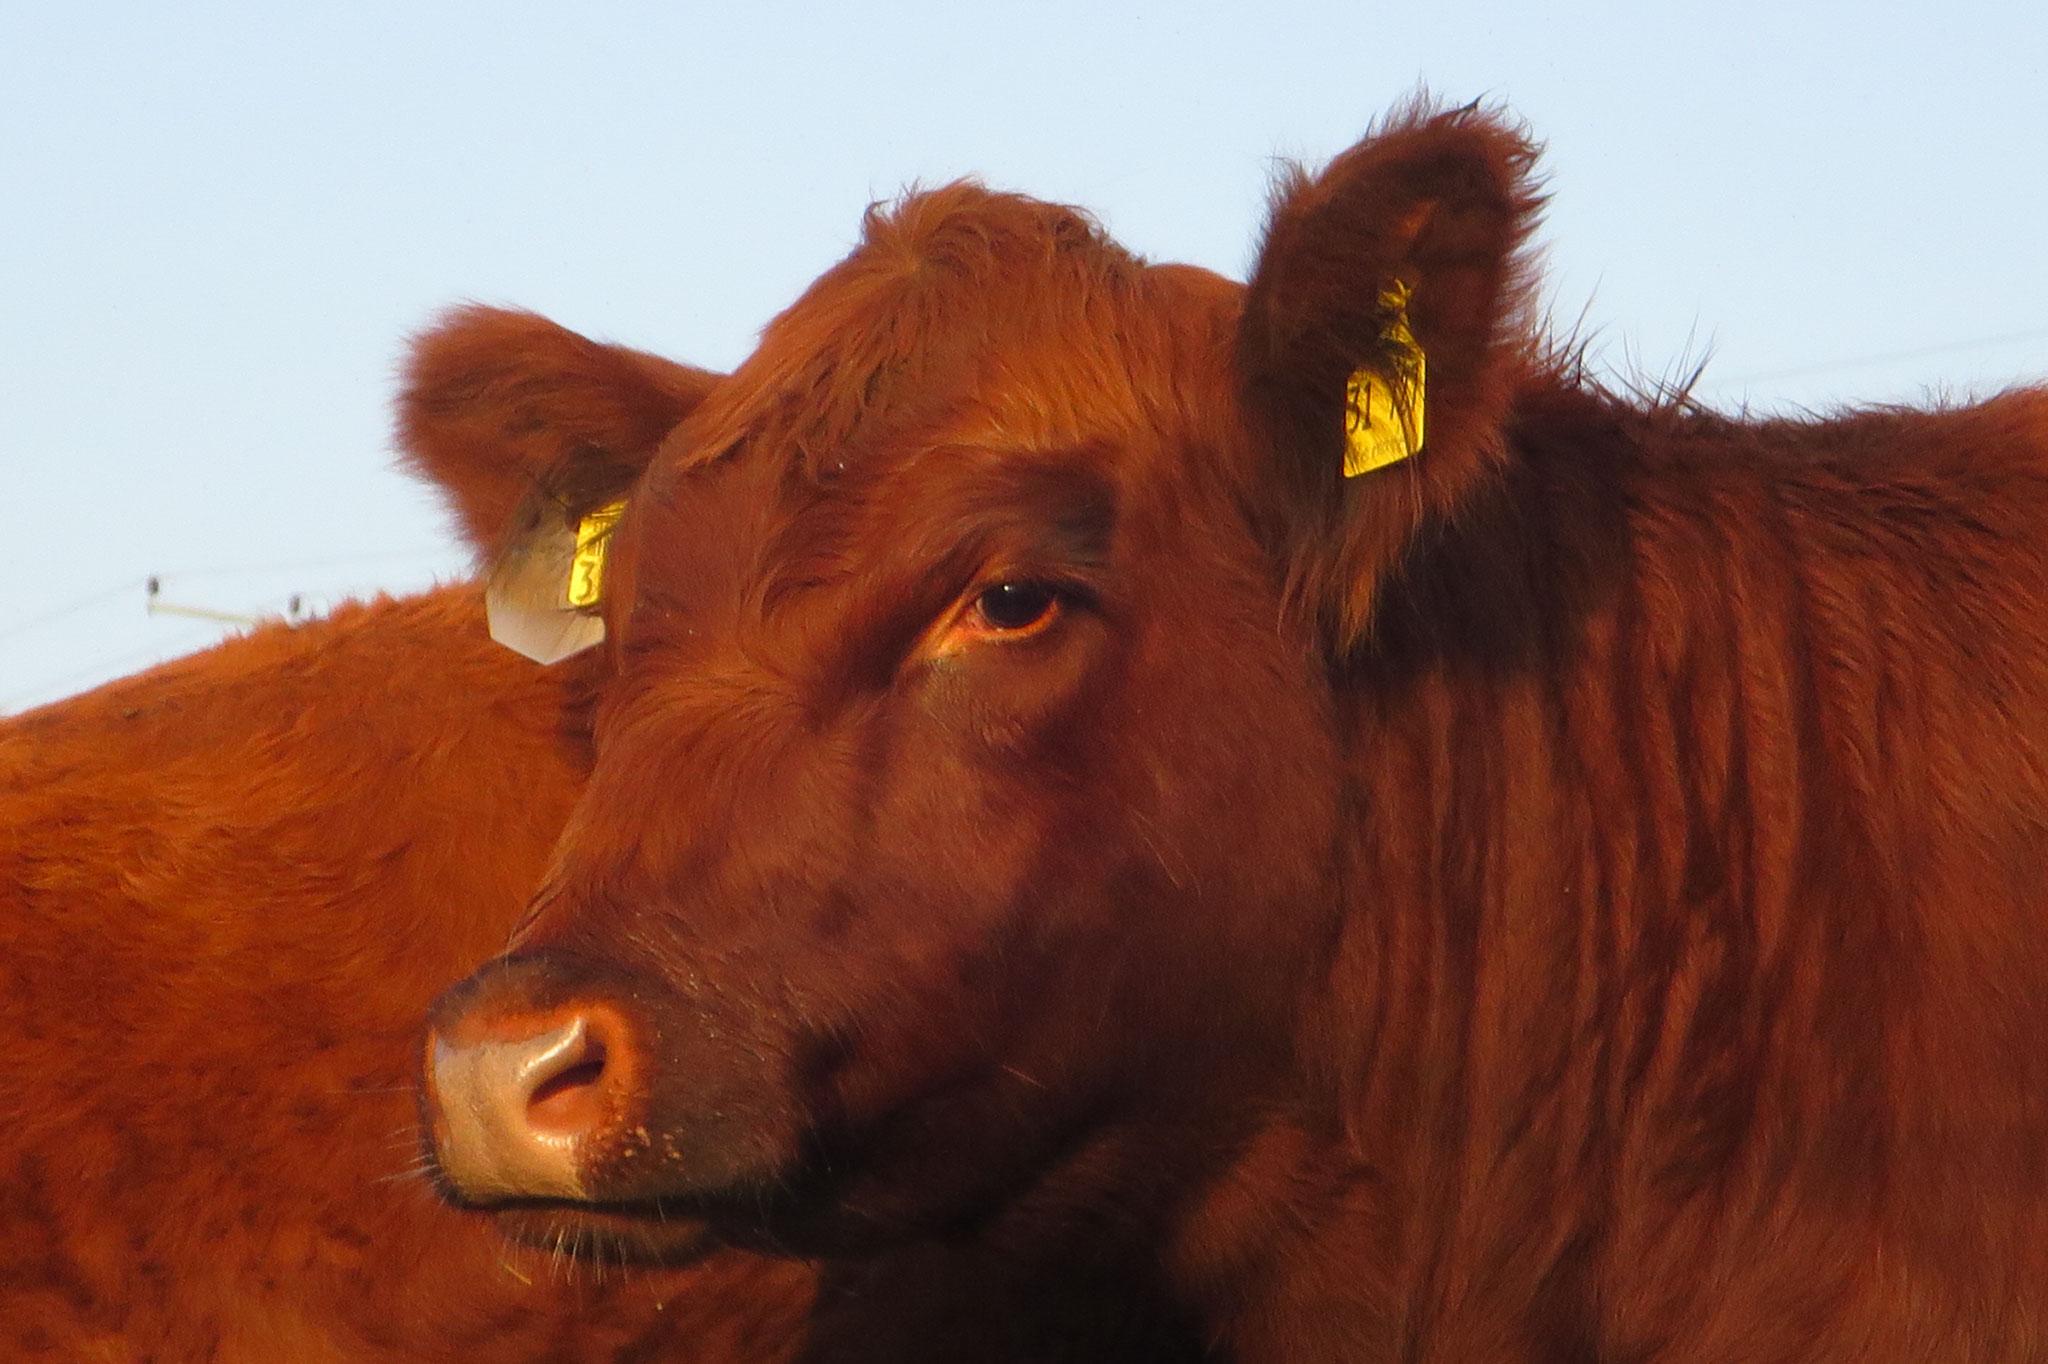 Oktober - Angus-Kuh in der Herbstsonne